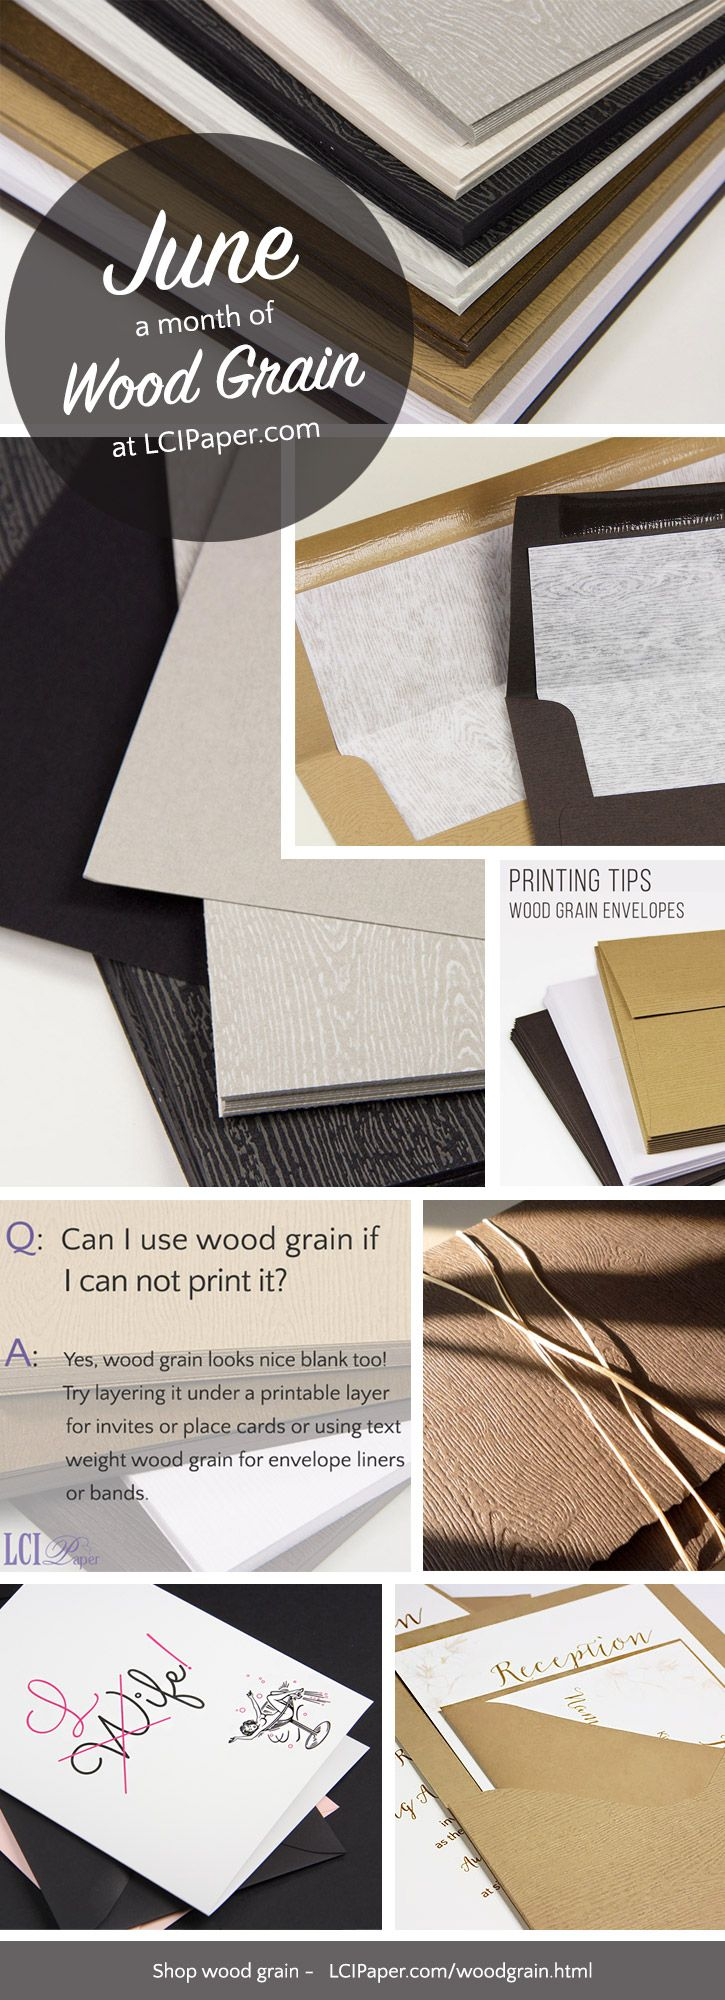 June wrap up - a month of wood grain paper at LCIPaper.com